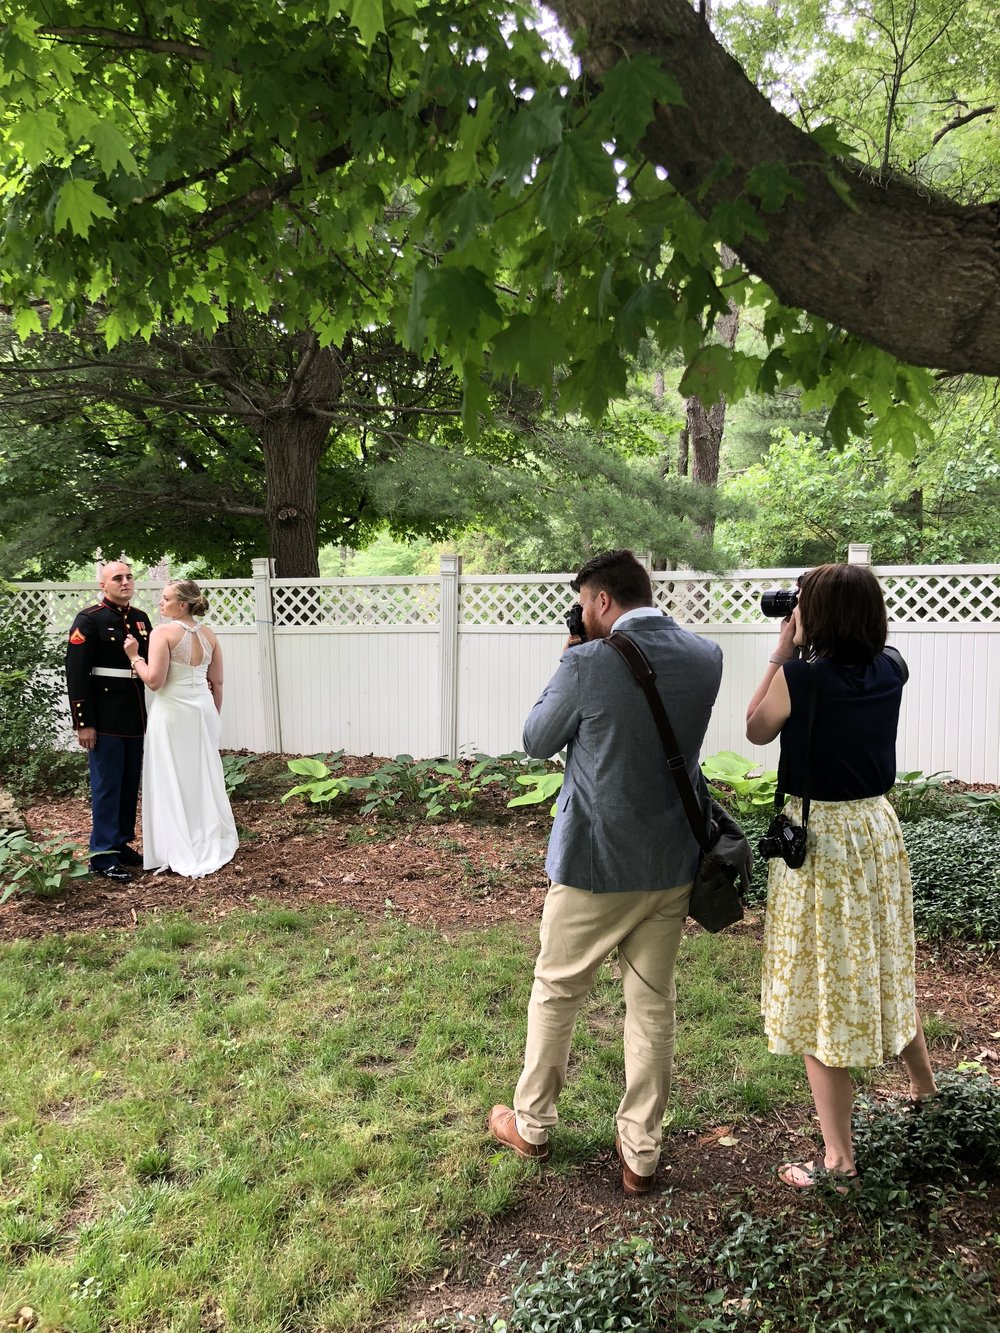 Wedding Photographers in Action at Toledo Ohio Wedding